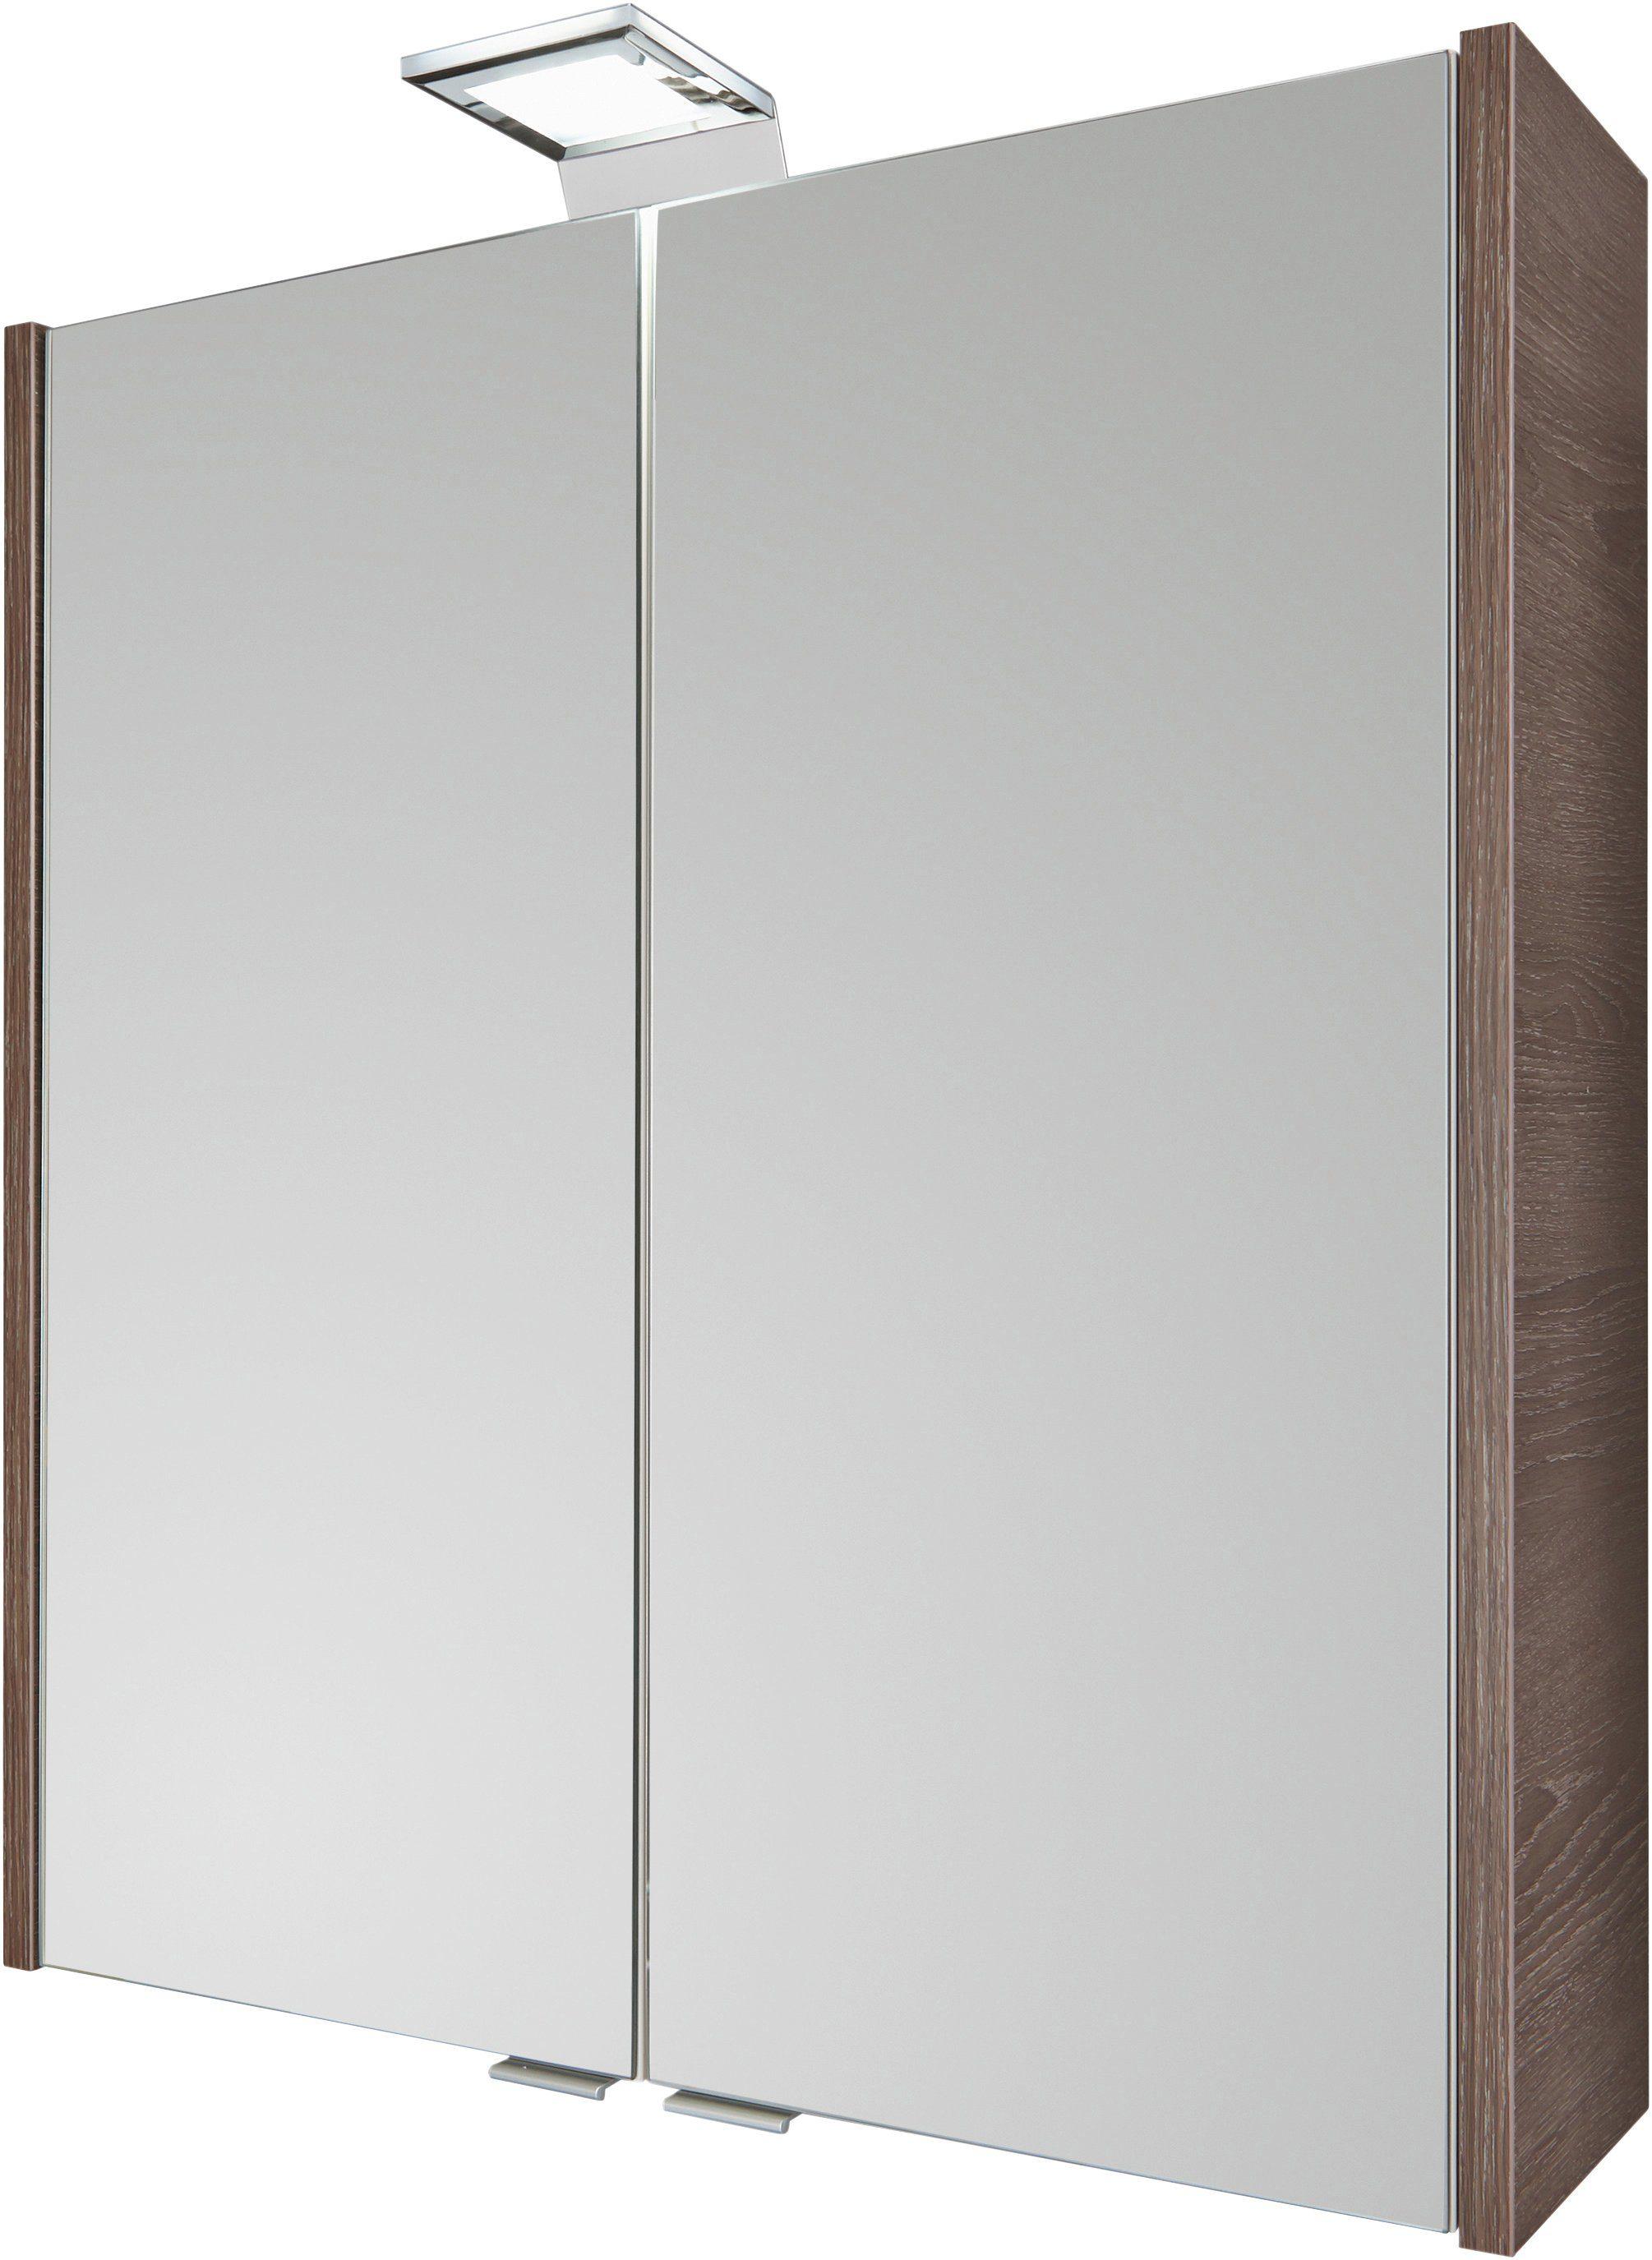 FACKELMANN Spiegelschrank »Malua - Cognac«, Breite 60 cm, 2 Türen